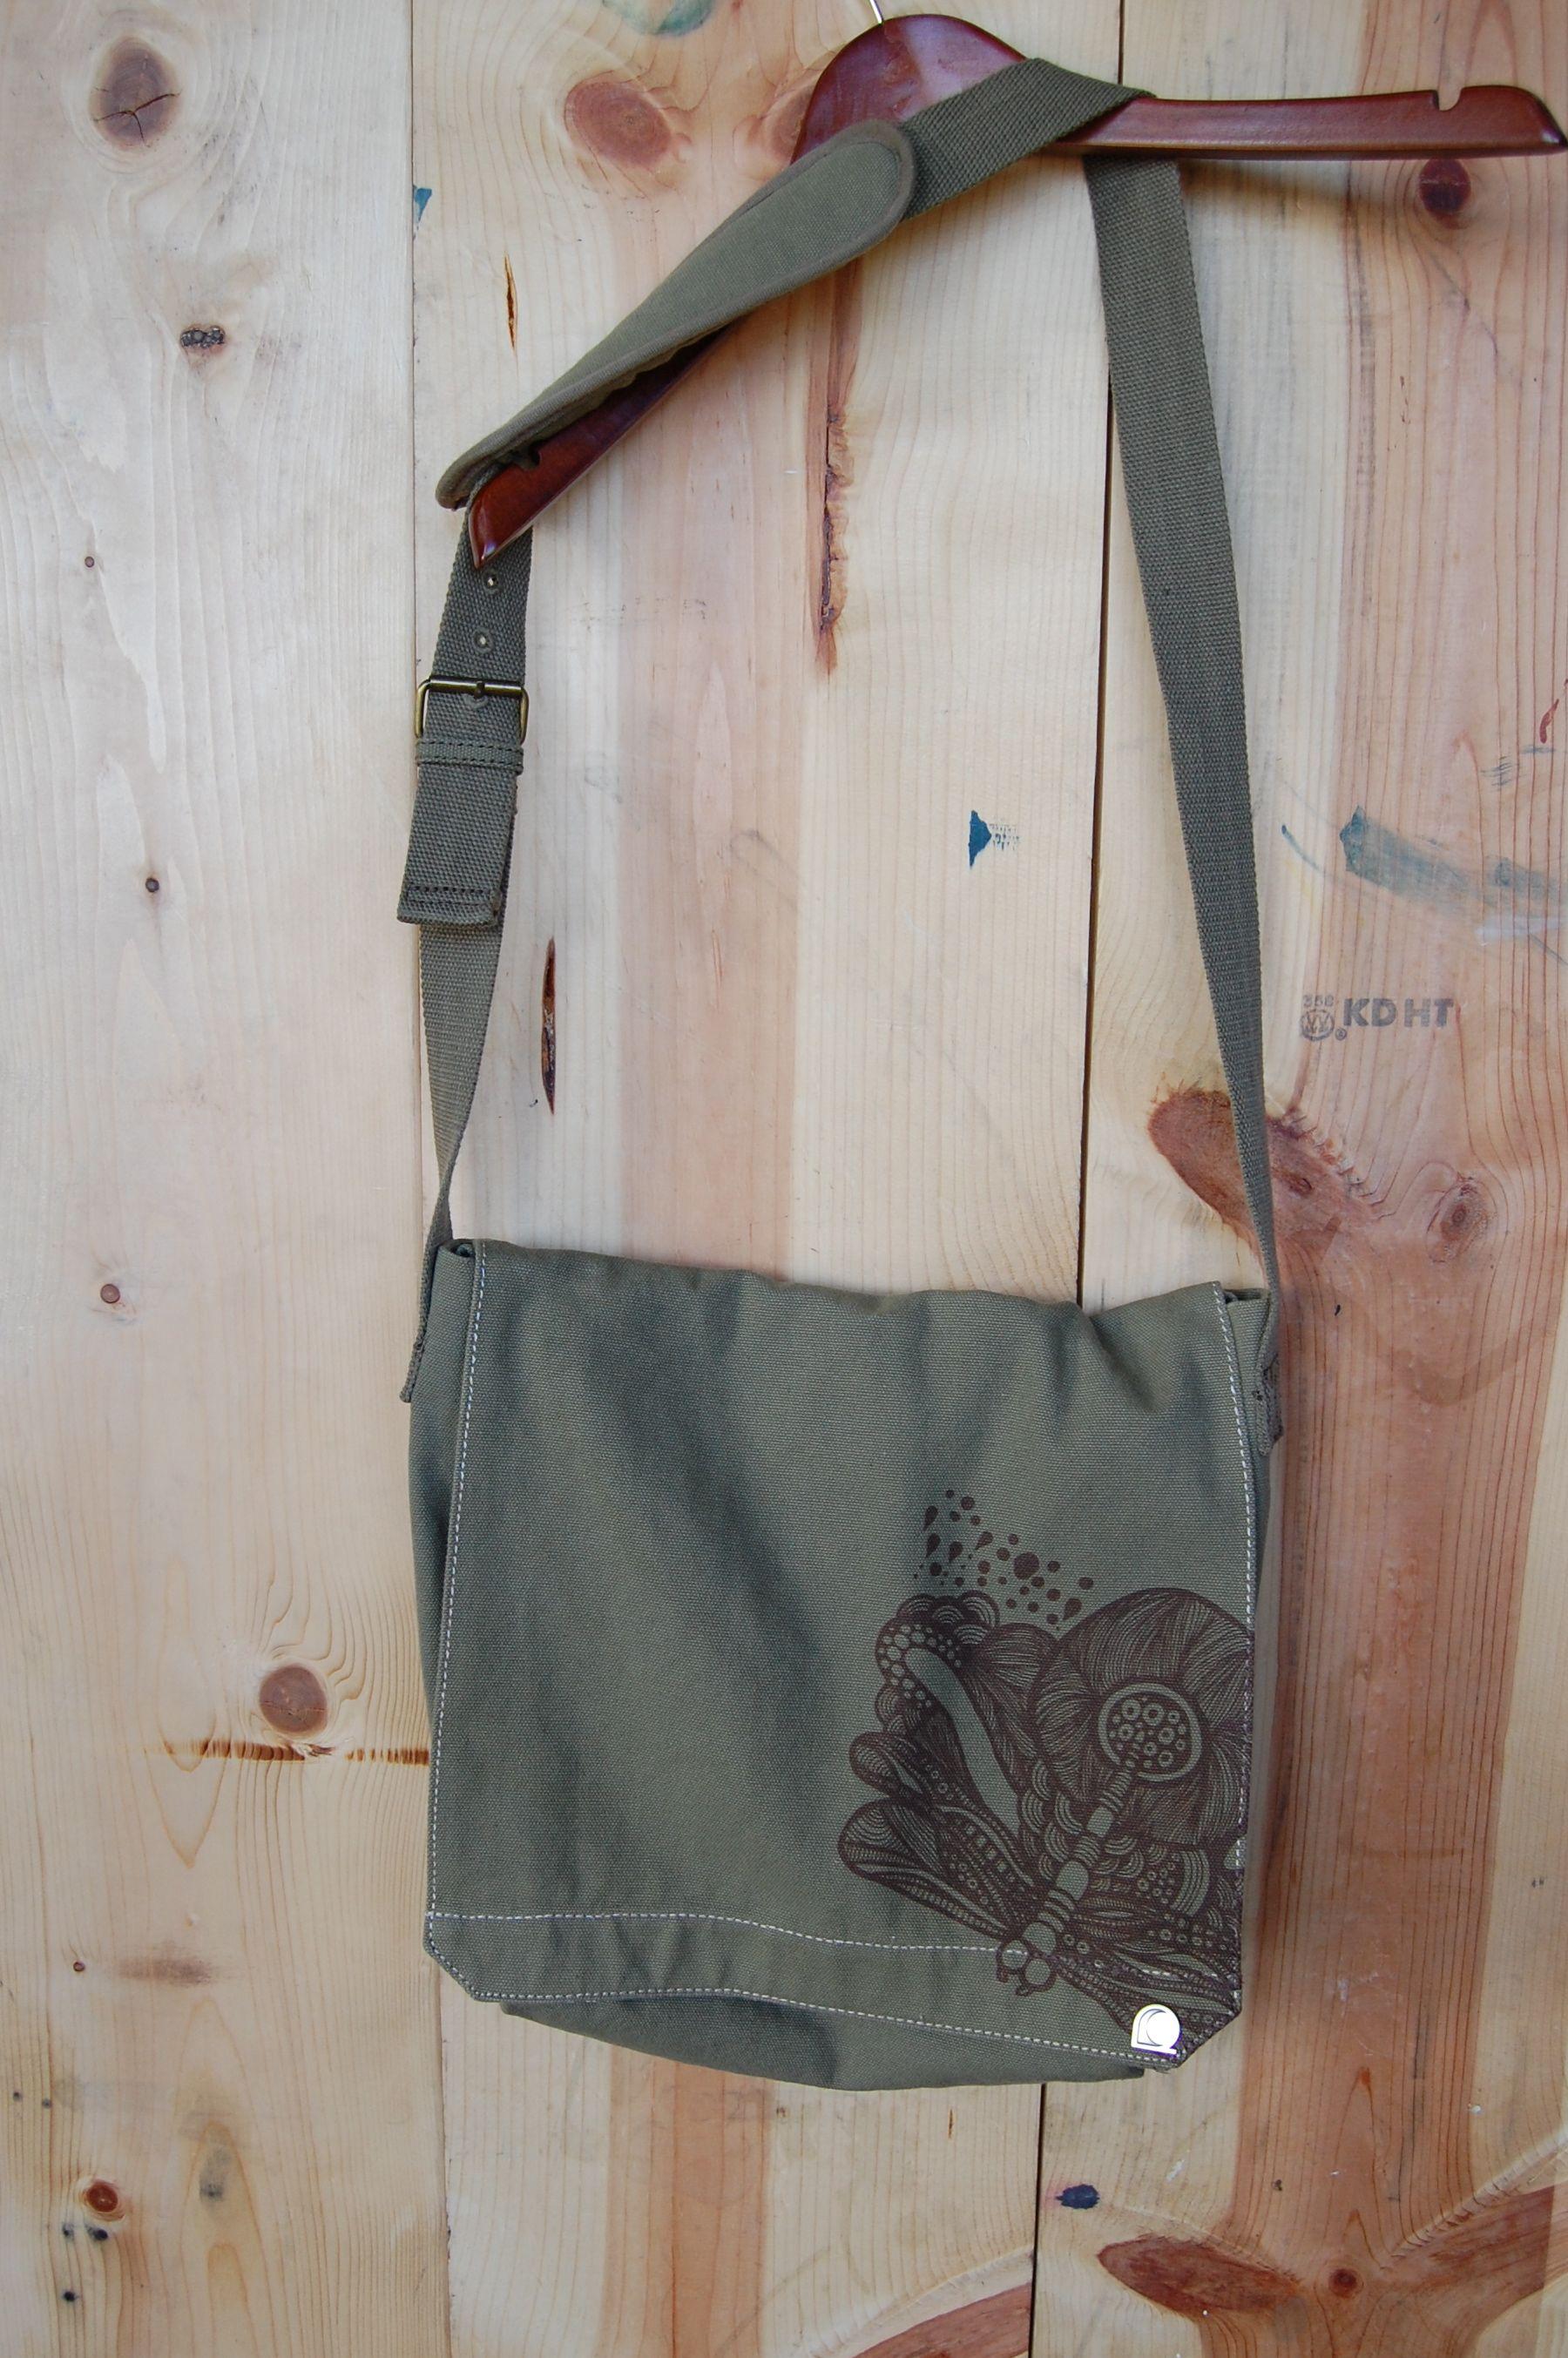 Dreamer design printed on Alternative Apparel Messenger Bag available on www.glyf.us #messengerbag